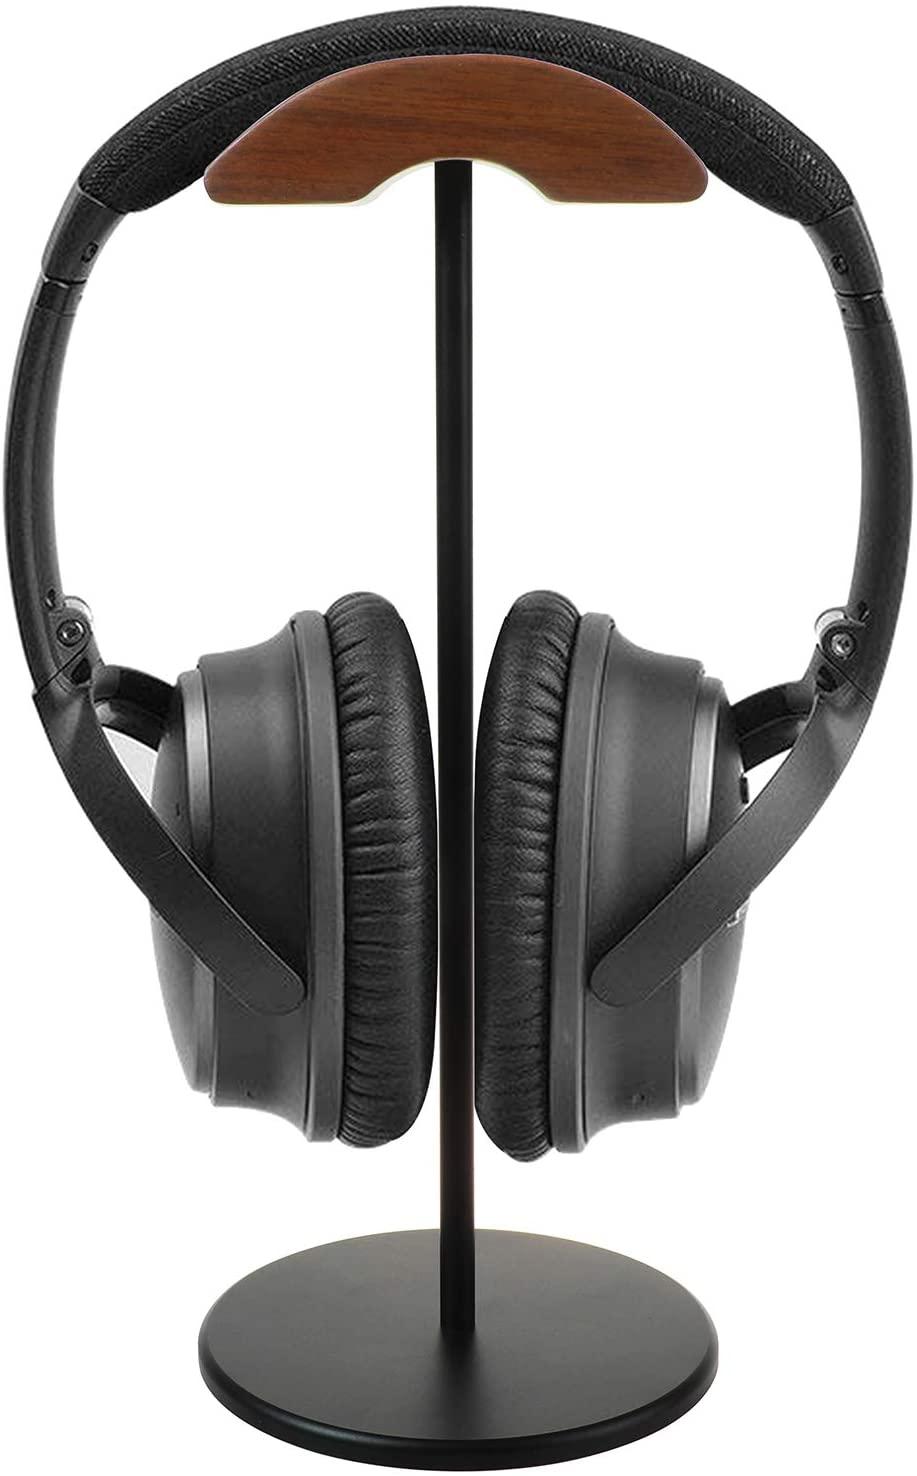 GreatCase Walnut Wood Headphone Black Stand Rack